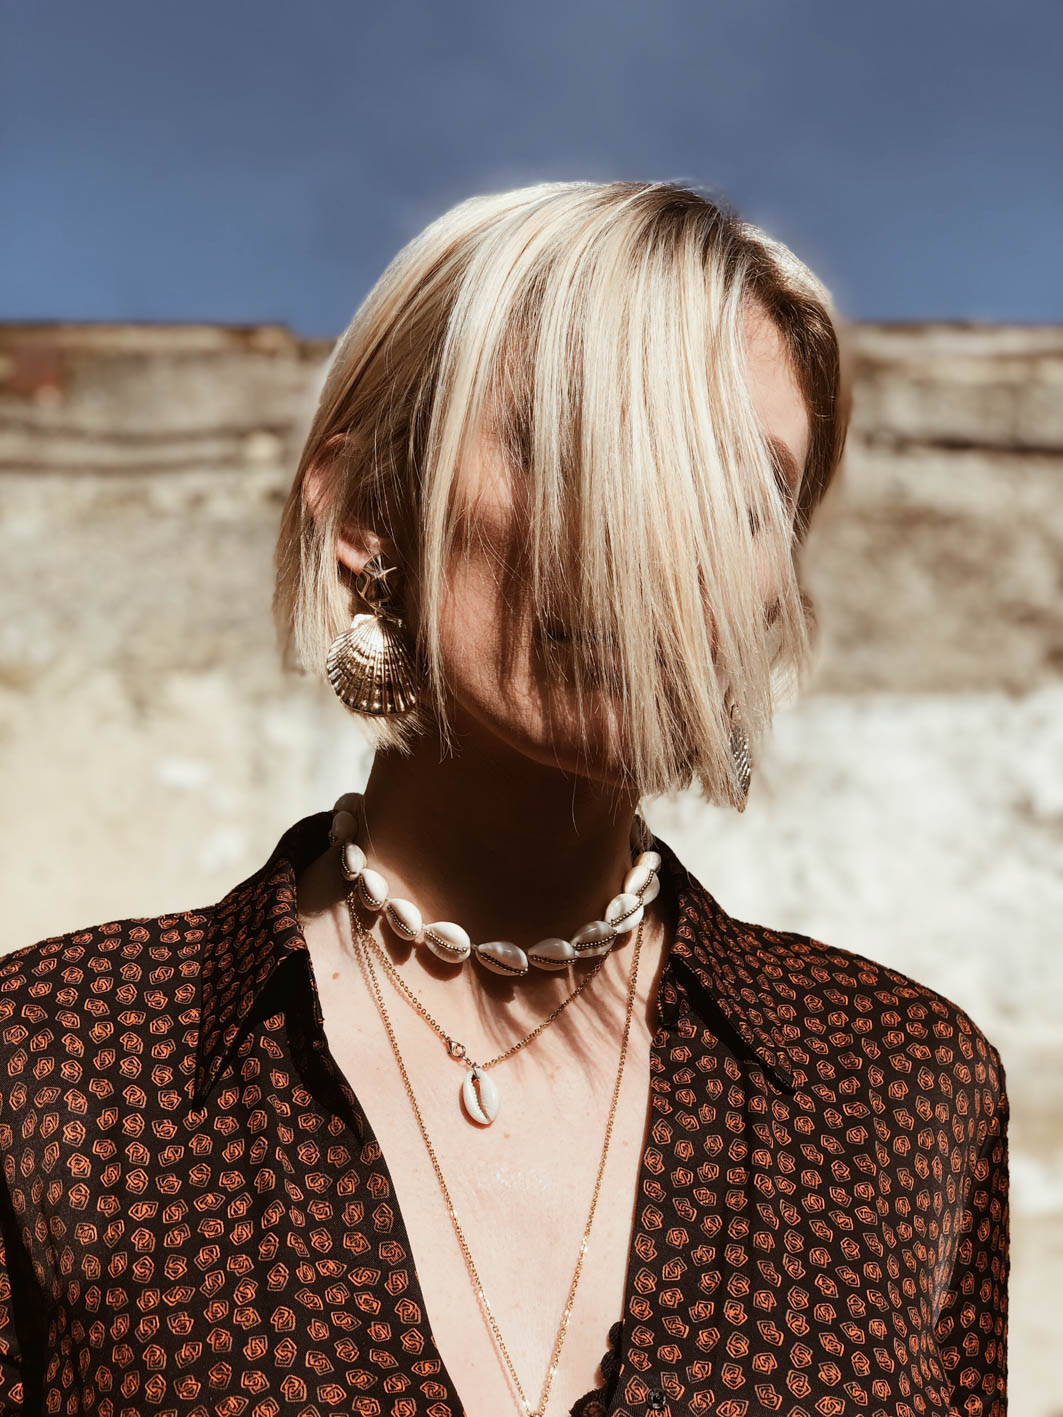 Carnet sauvage- blog mode et tendances - Bijoux coquillages3.jpg